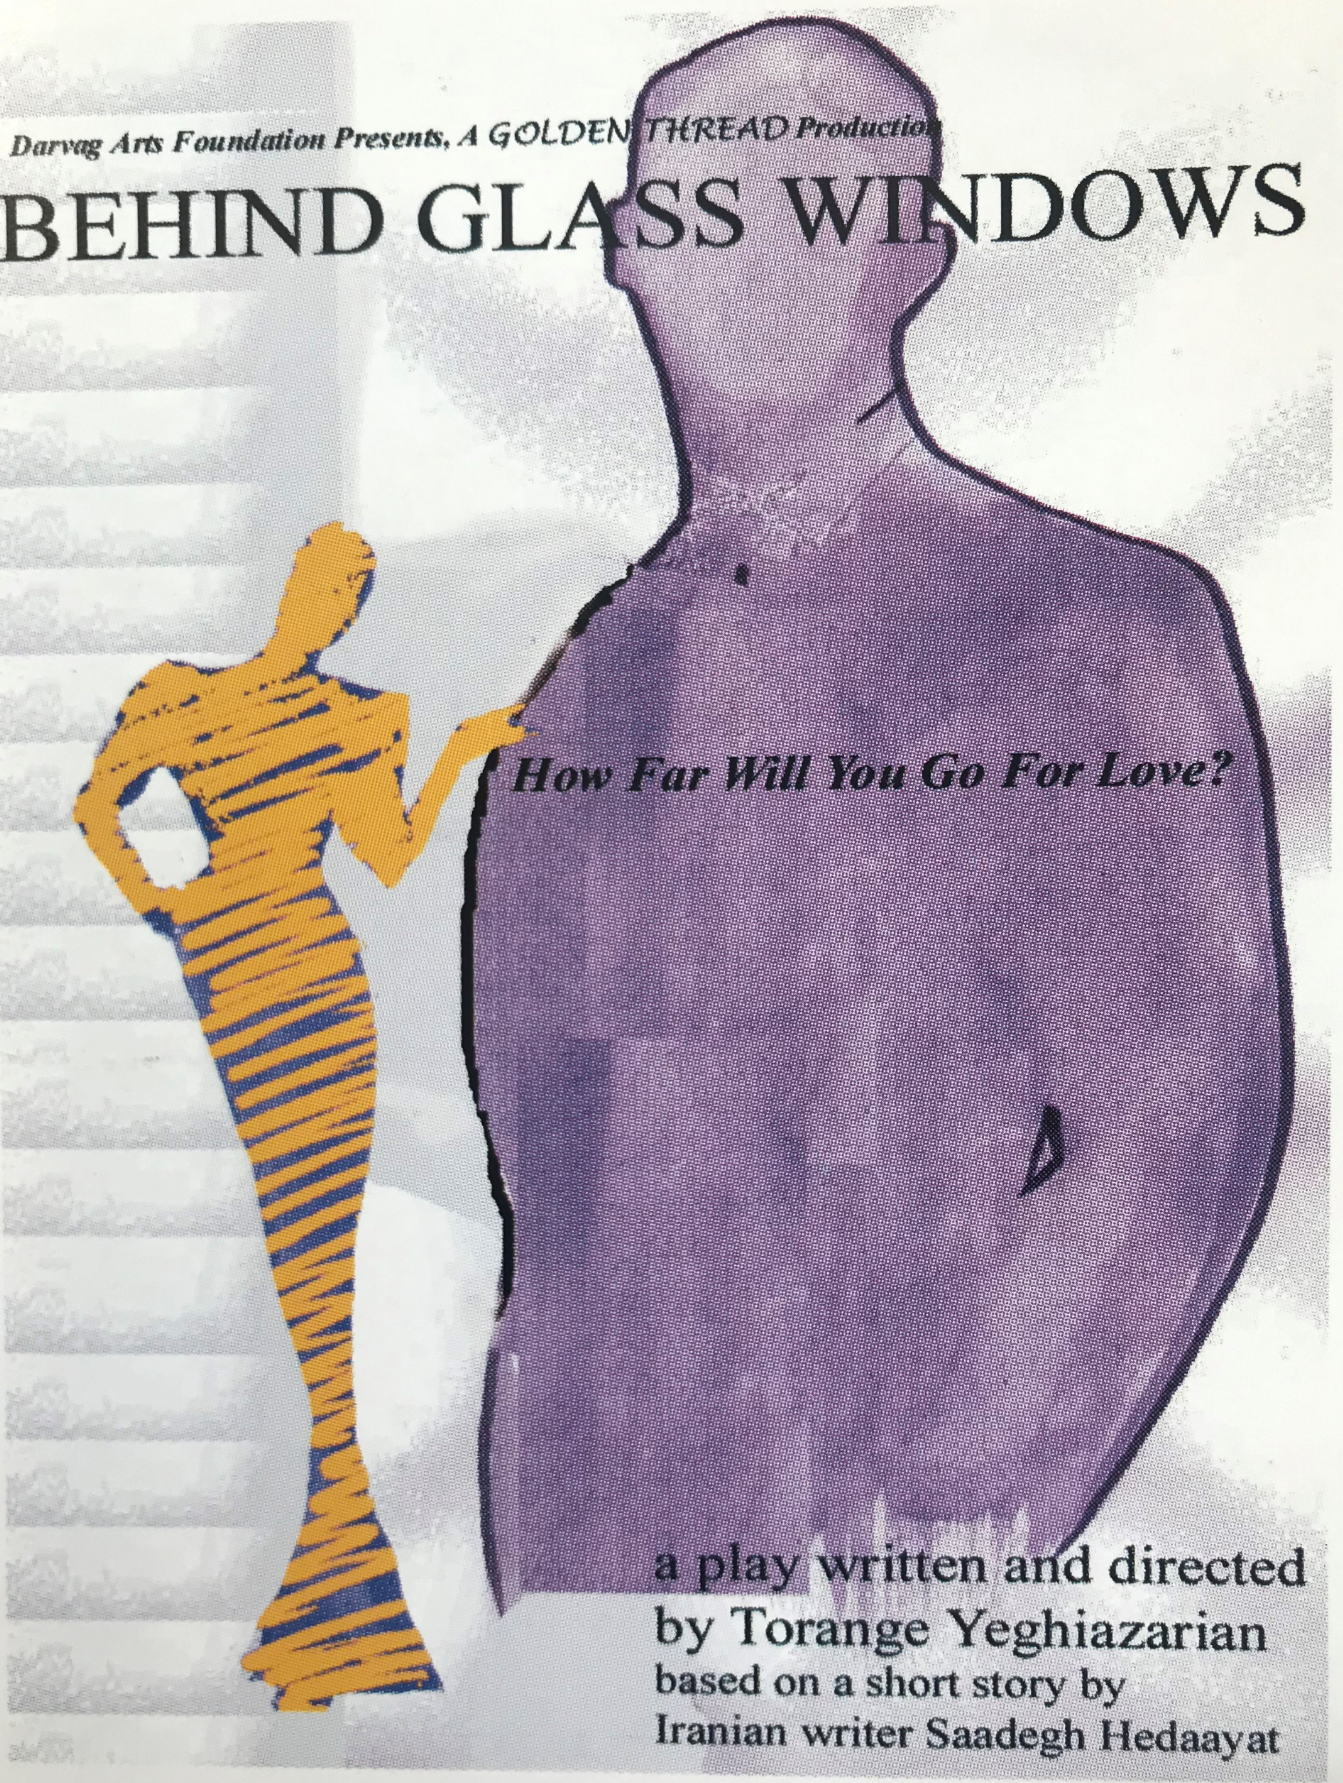 Behind Glass Windows